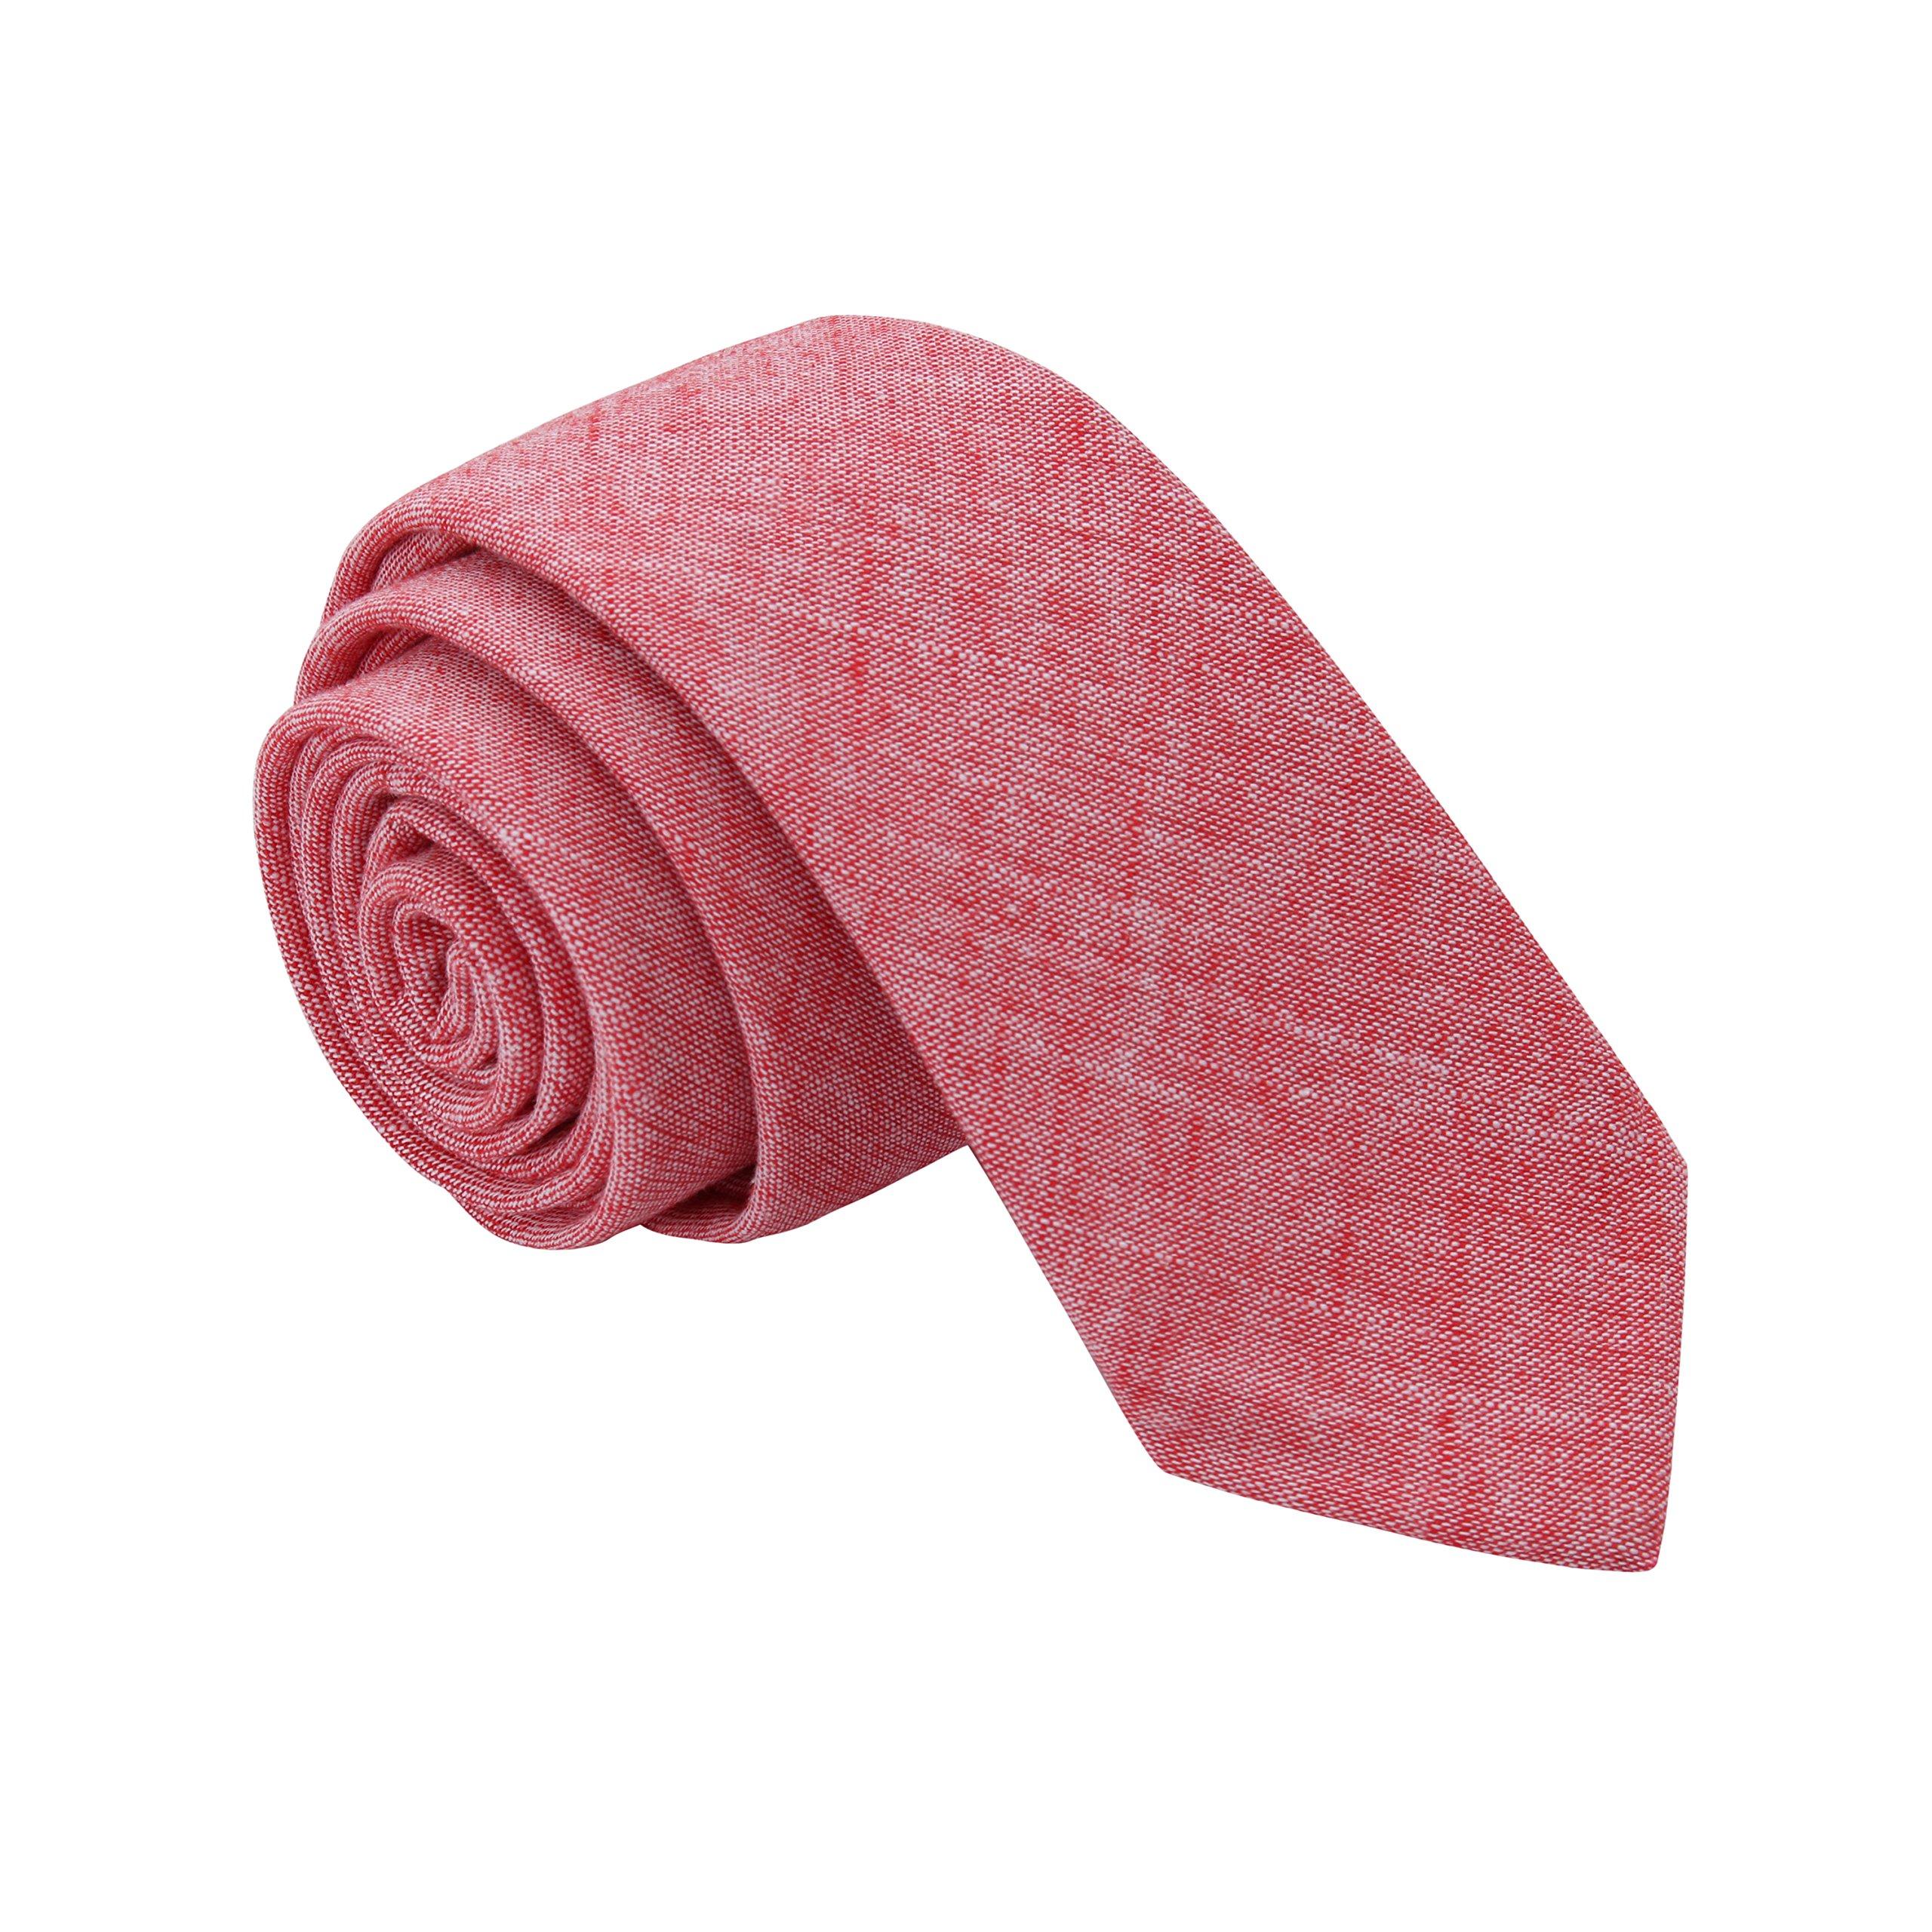 Tsheoul Noted Men's cotton Plain Neck Tie+ Gift Box